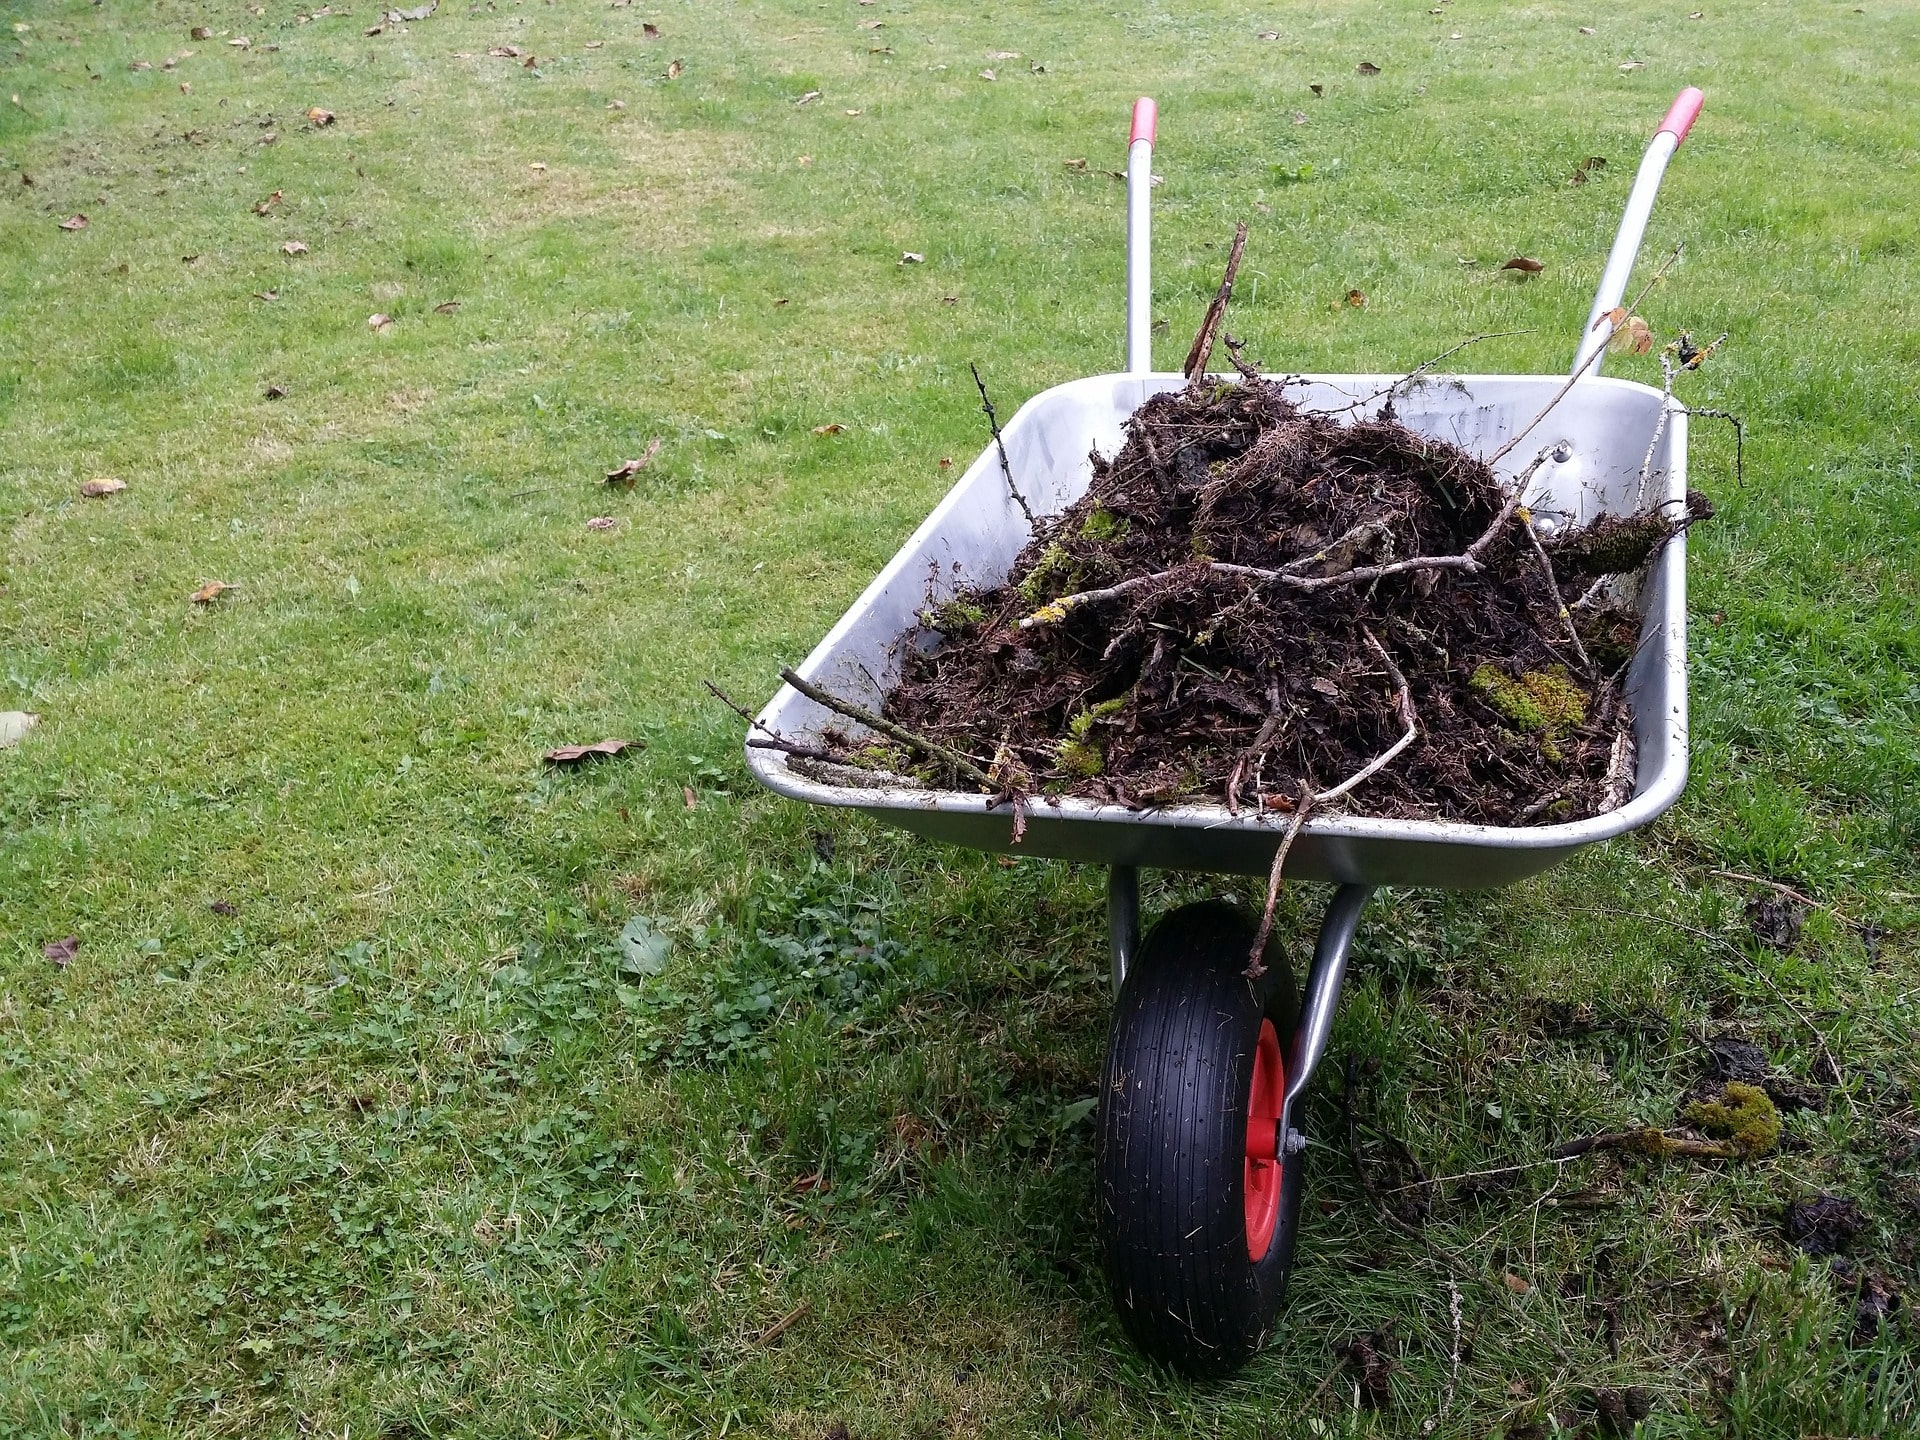 Wheelbarrow full of logs and dirt.